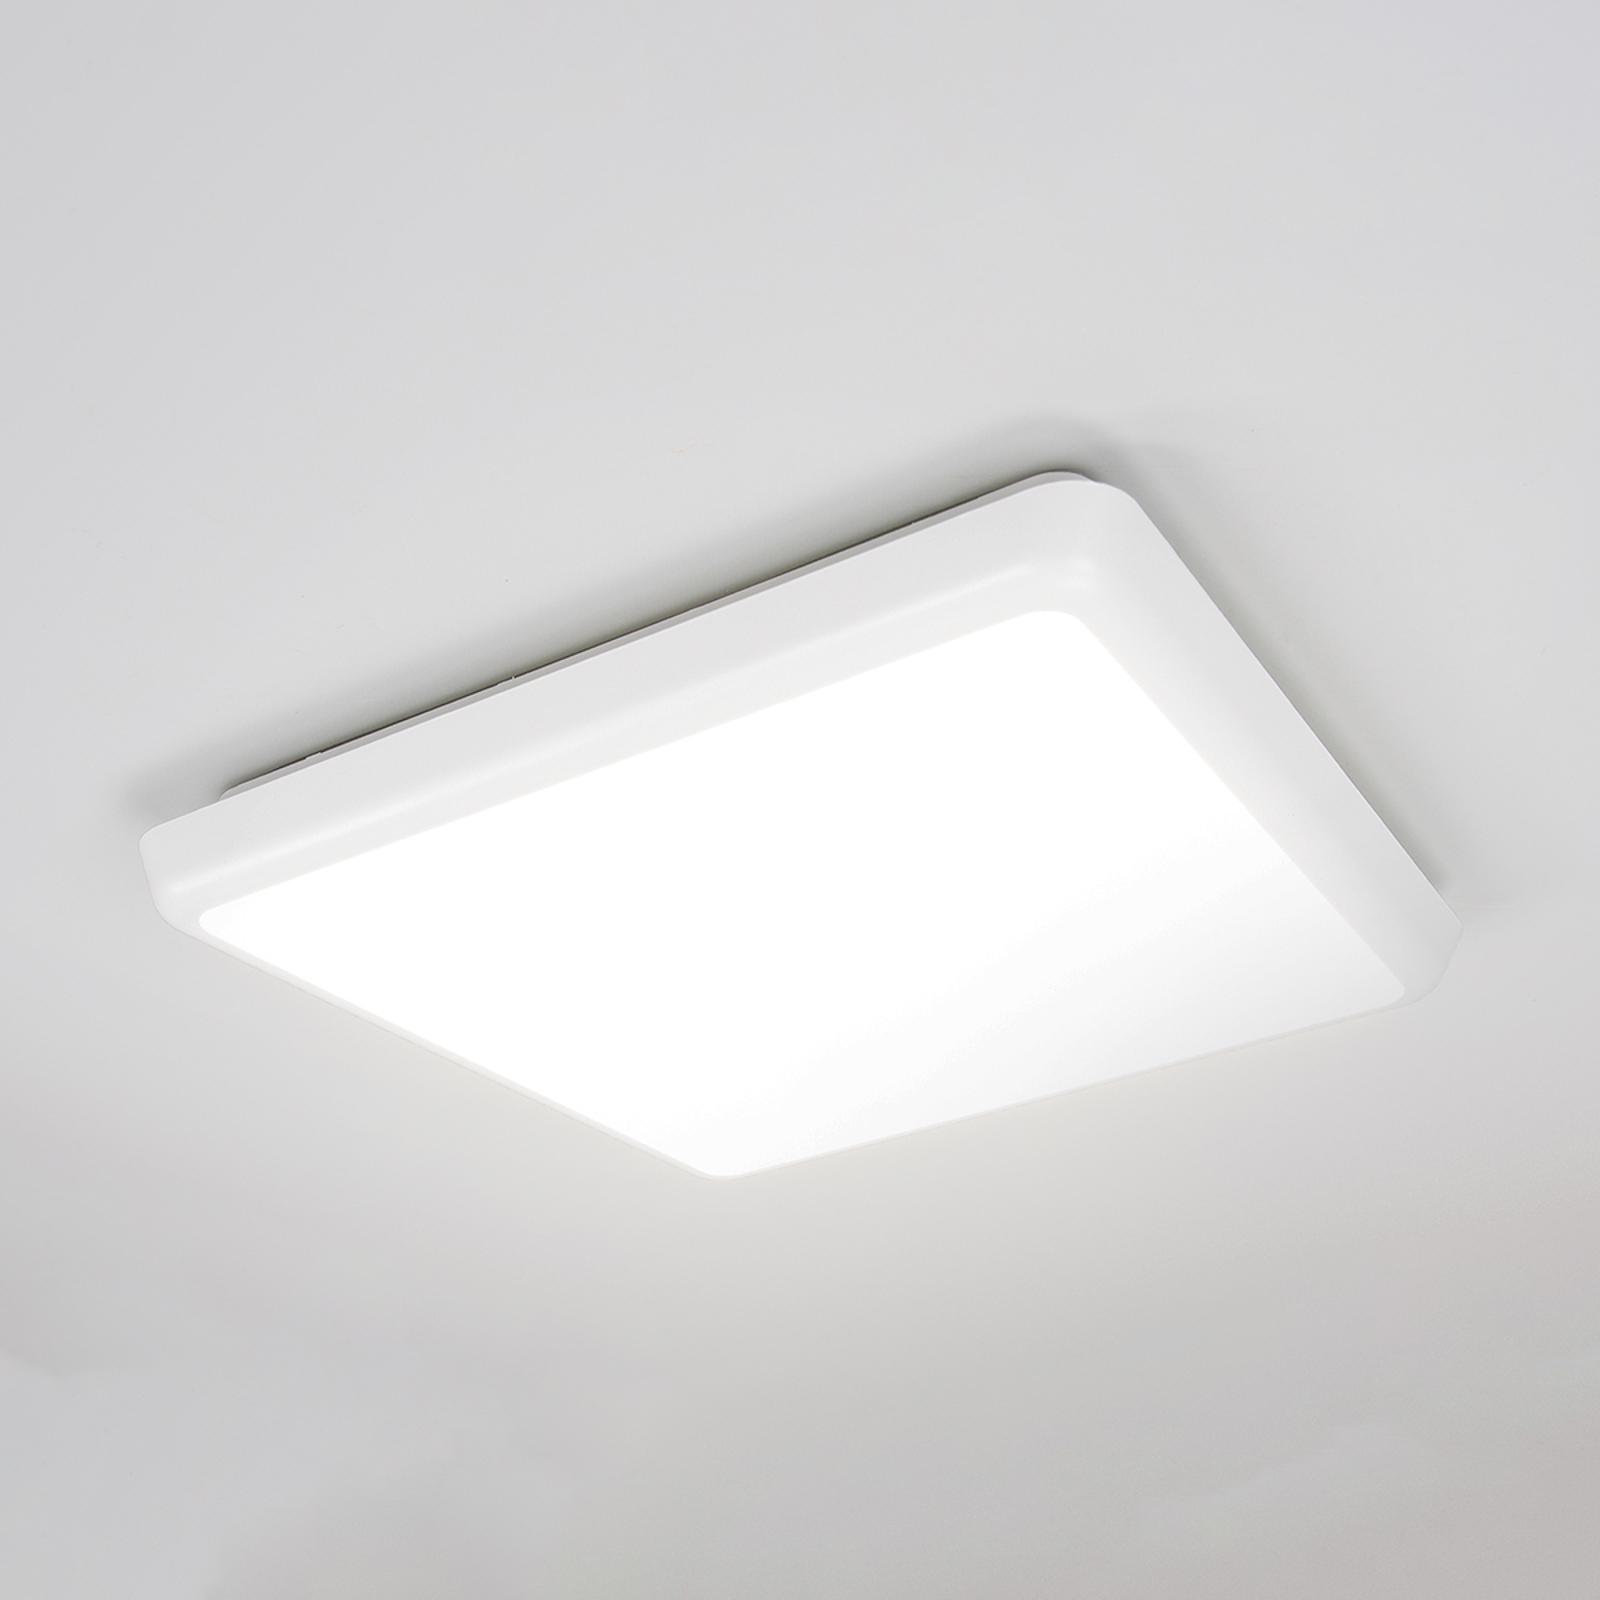 Prosta lampa sufitowa Augustin z LED, IP54